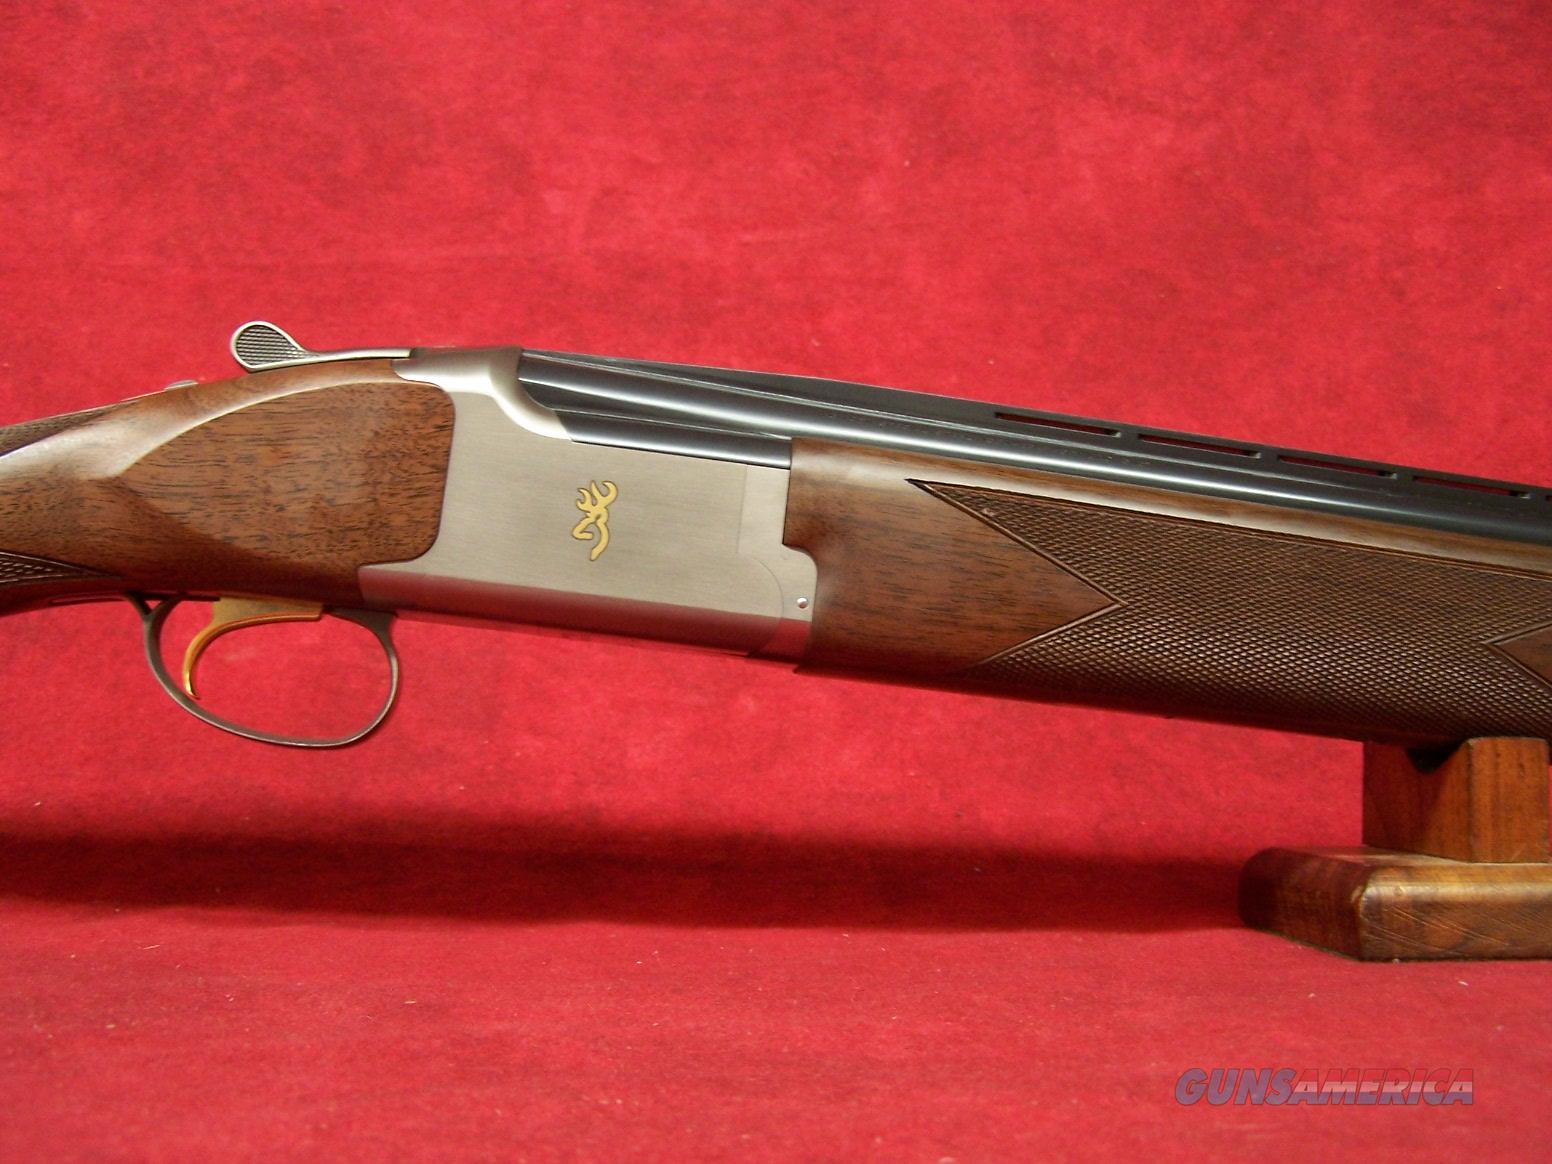 "Browning Citori White Satin Hunter 12ga 3.5"" Chamber 28"" Barrel (018161204)  Guns > Shotguns > Browning Shotguns > Over Unders > Citori > Hunting"